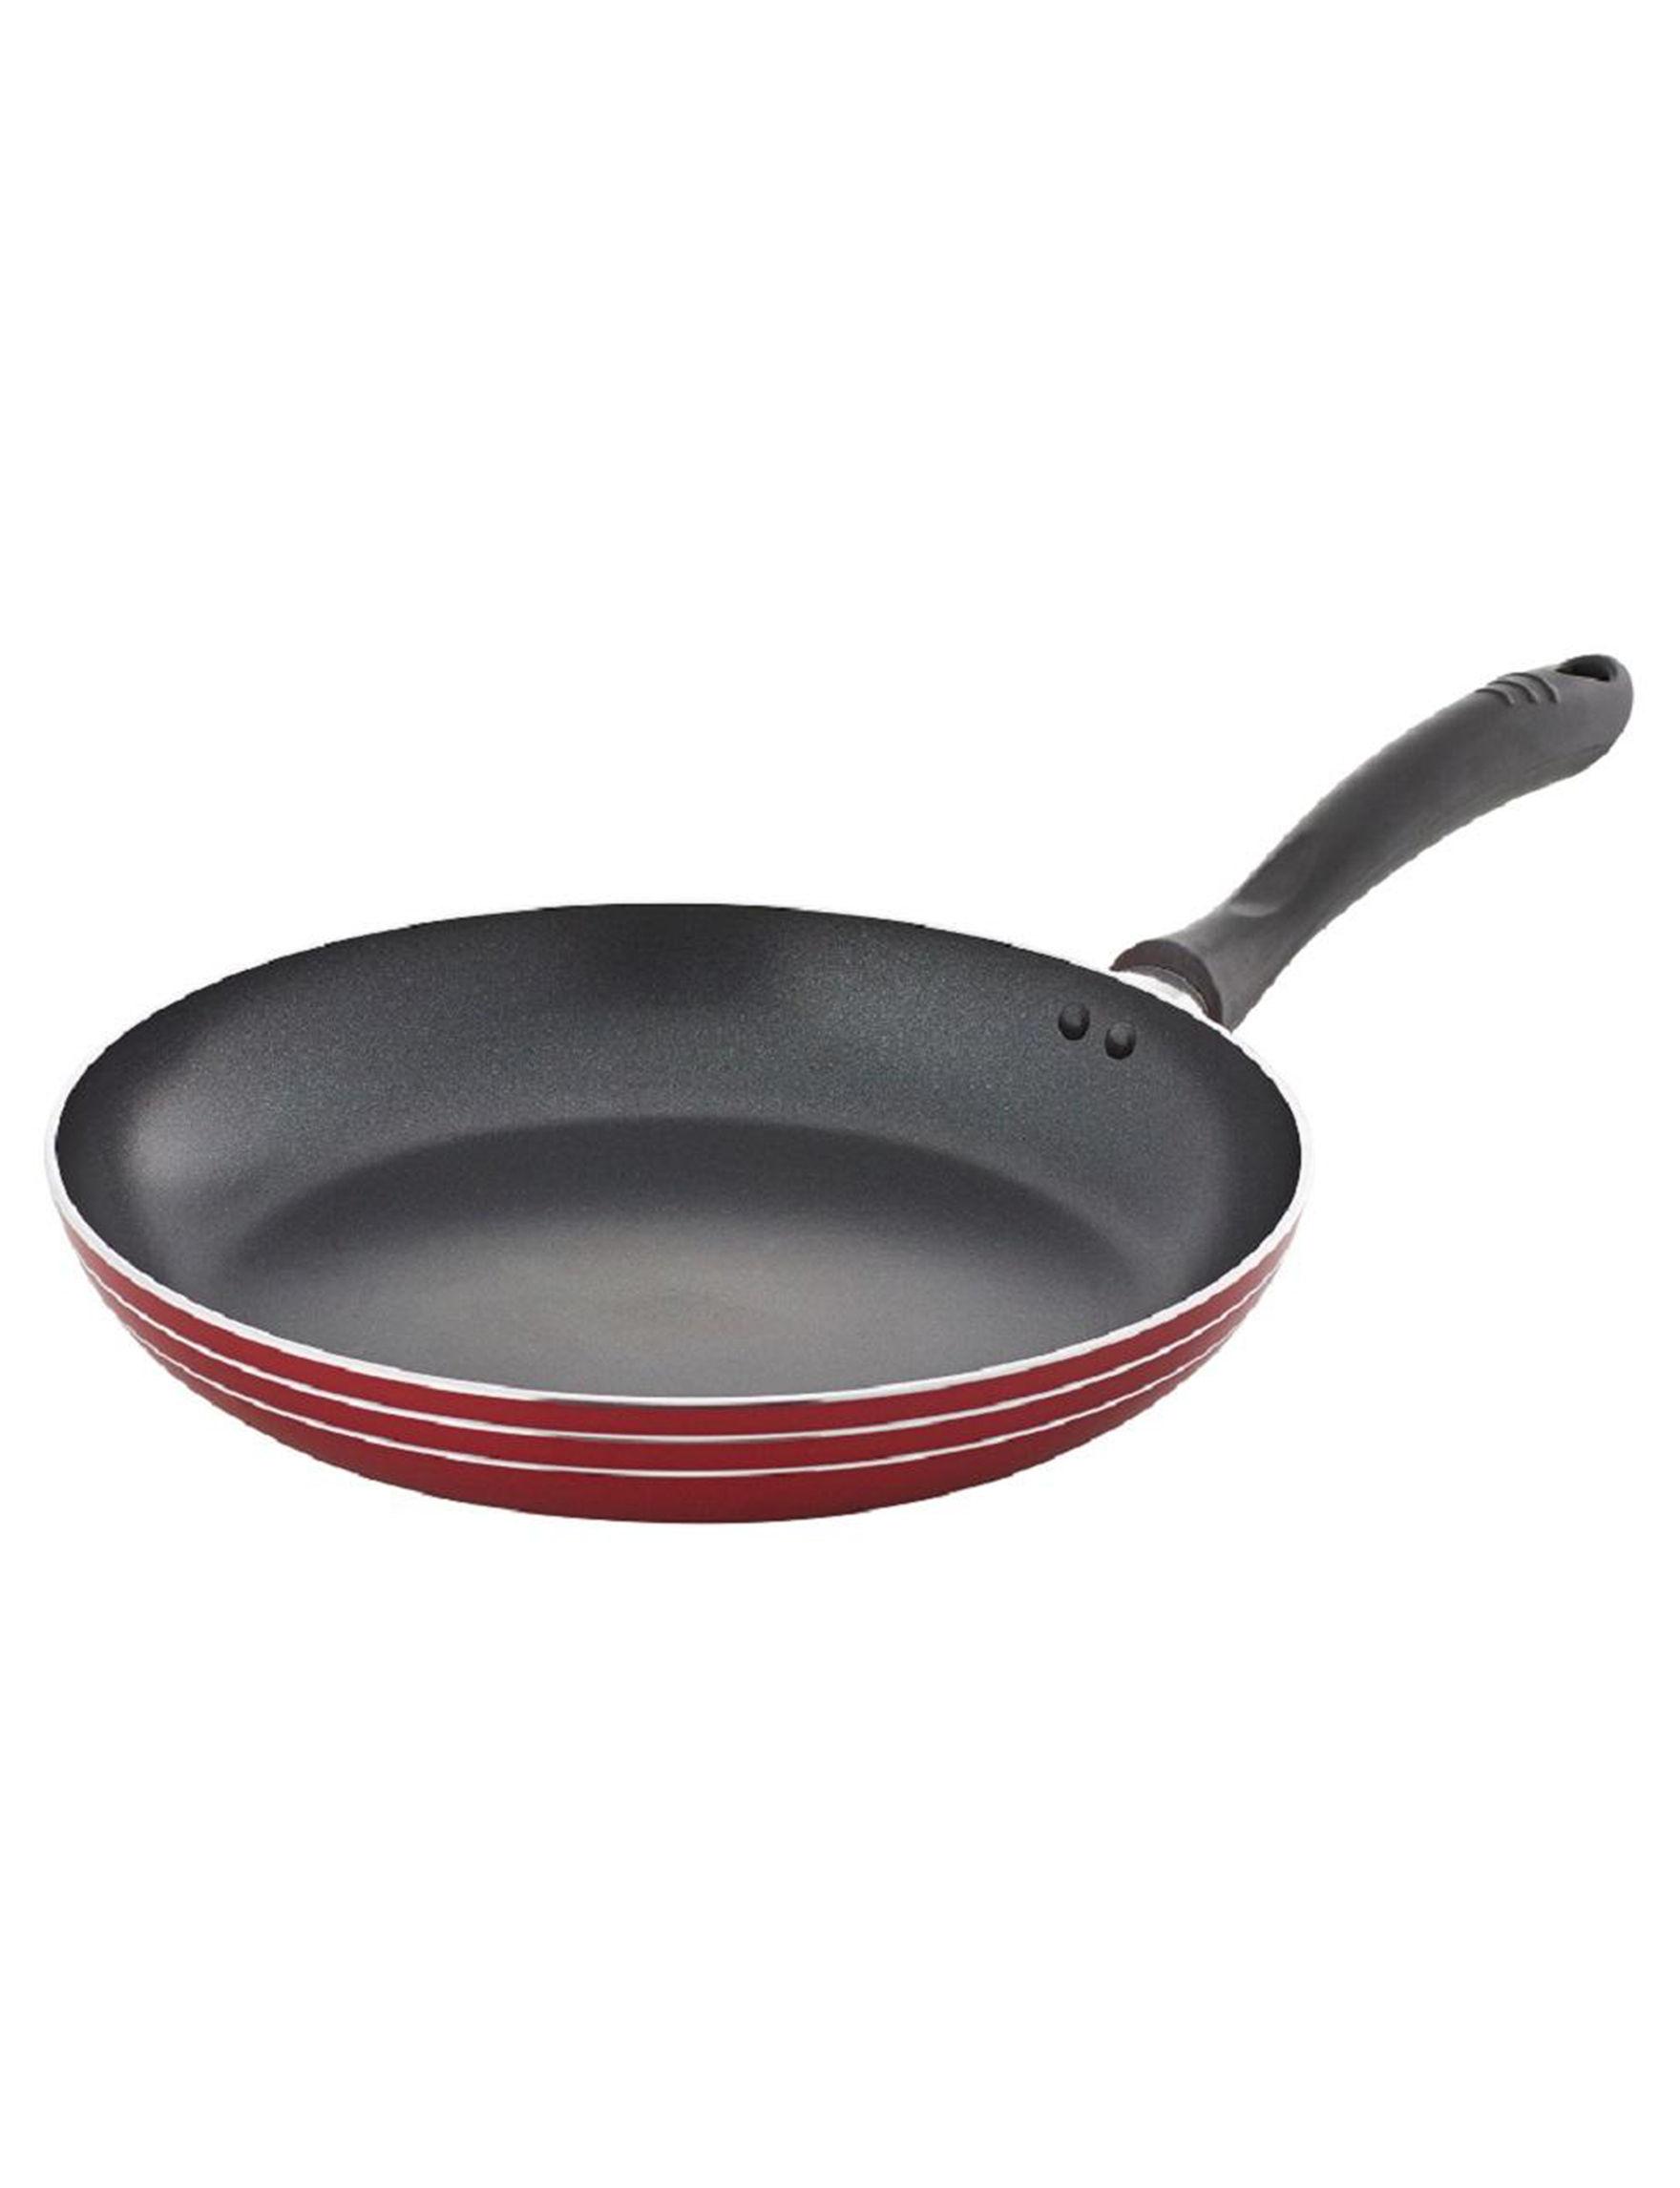 Smart Living  Frying Pans & Skillets Cookware